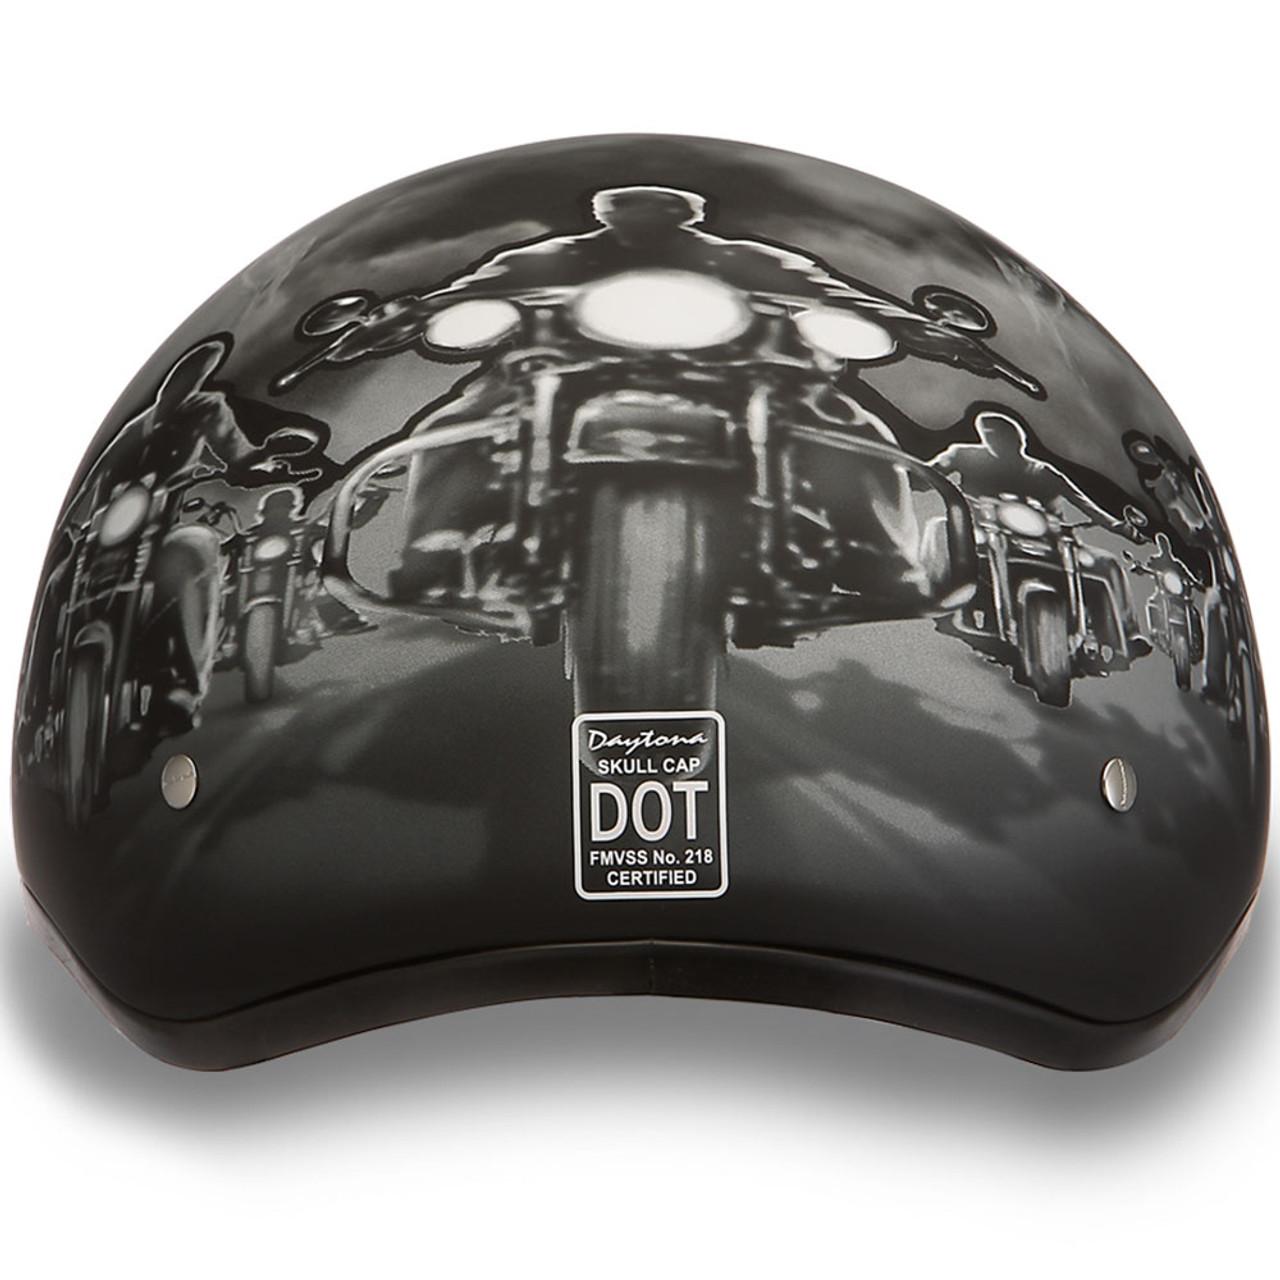 57908d0e46d Daytona DOT Guns Half Shell Motorcycle Helmet - Get Lowered Cycles